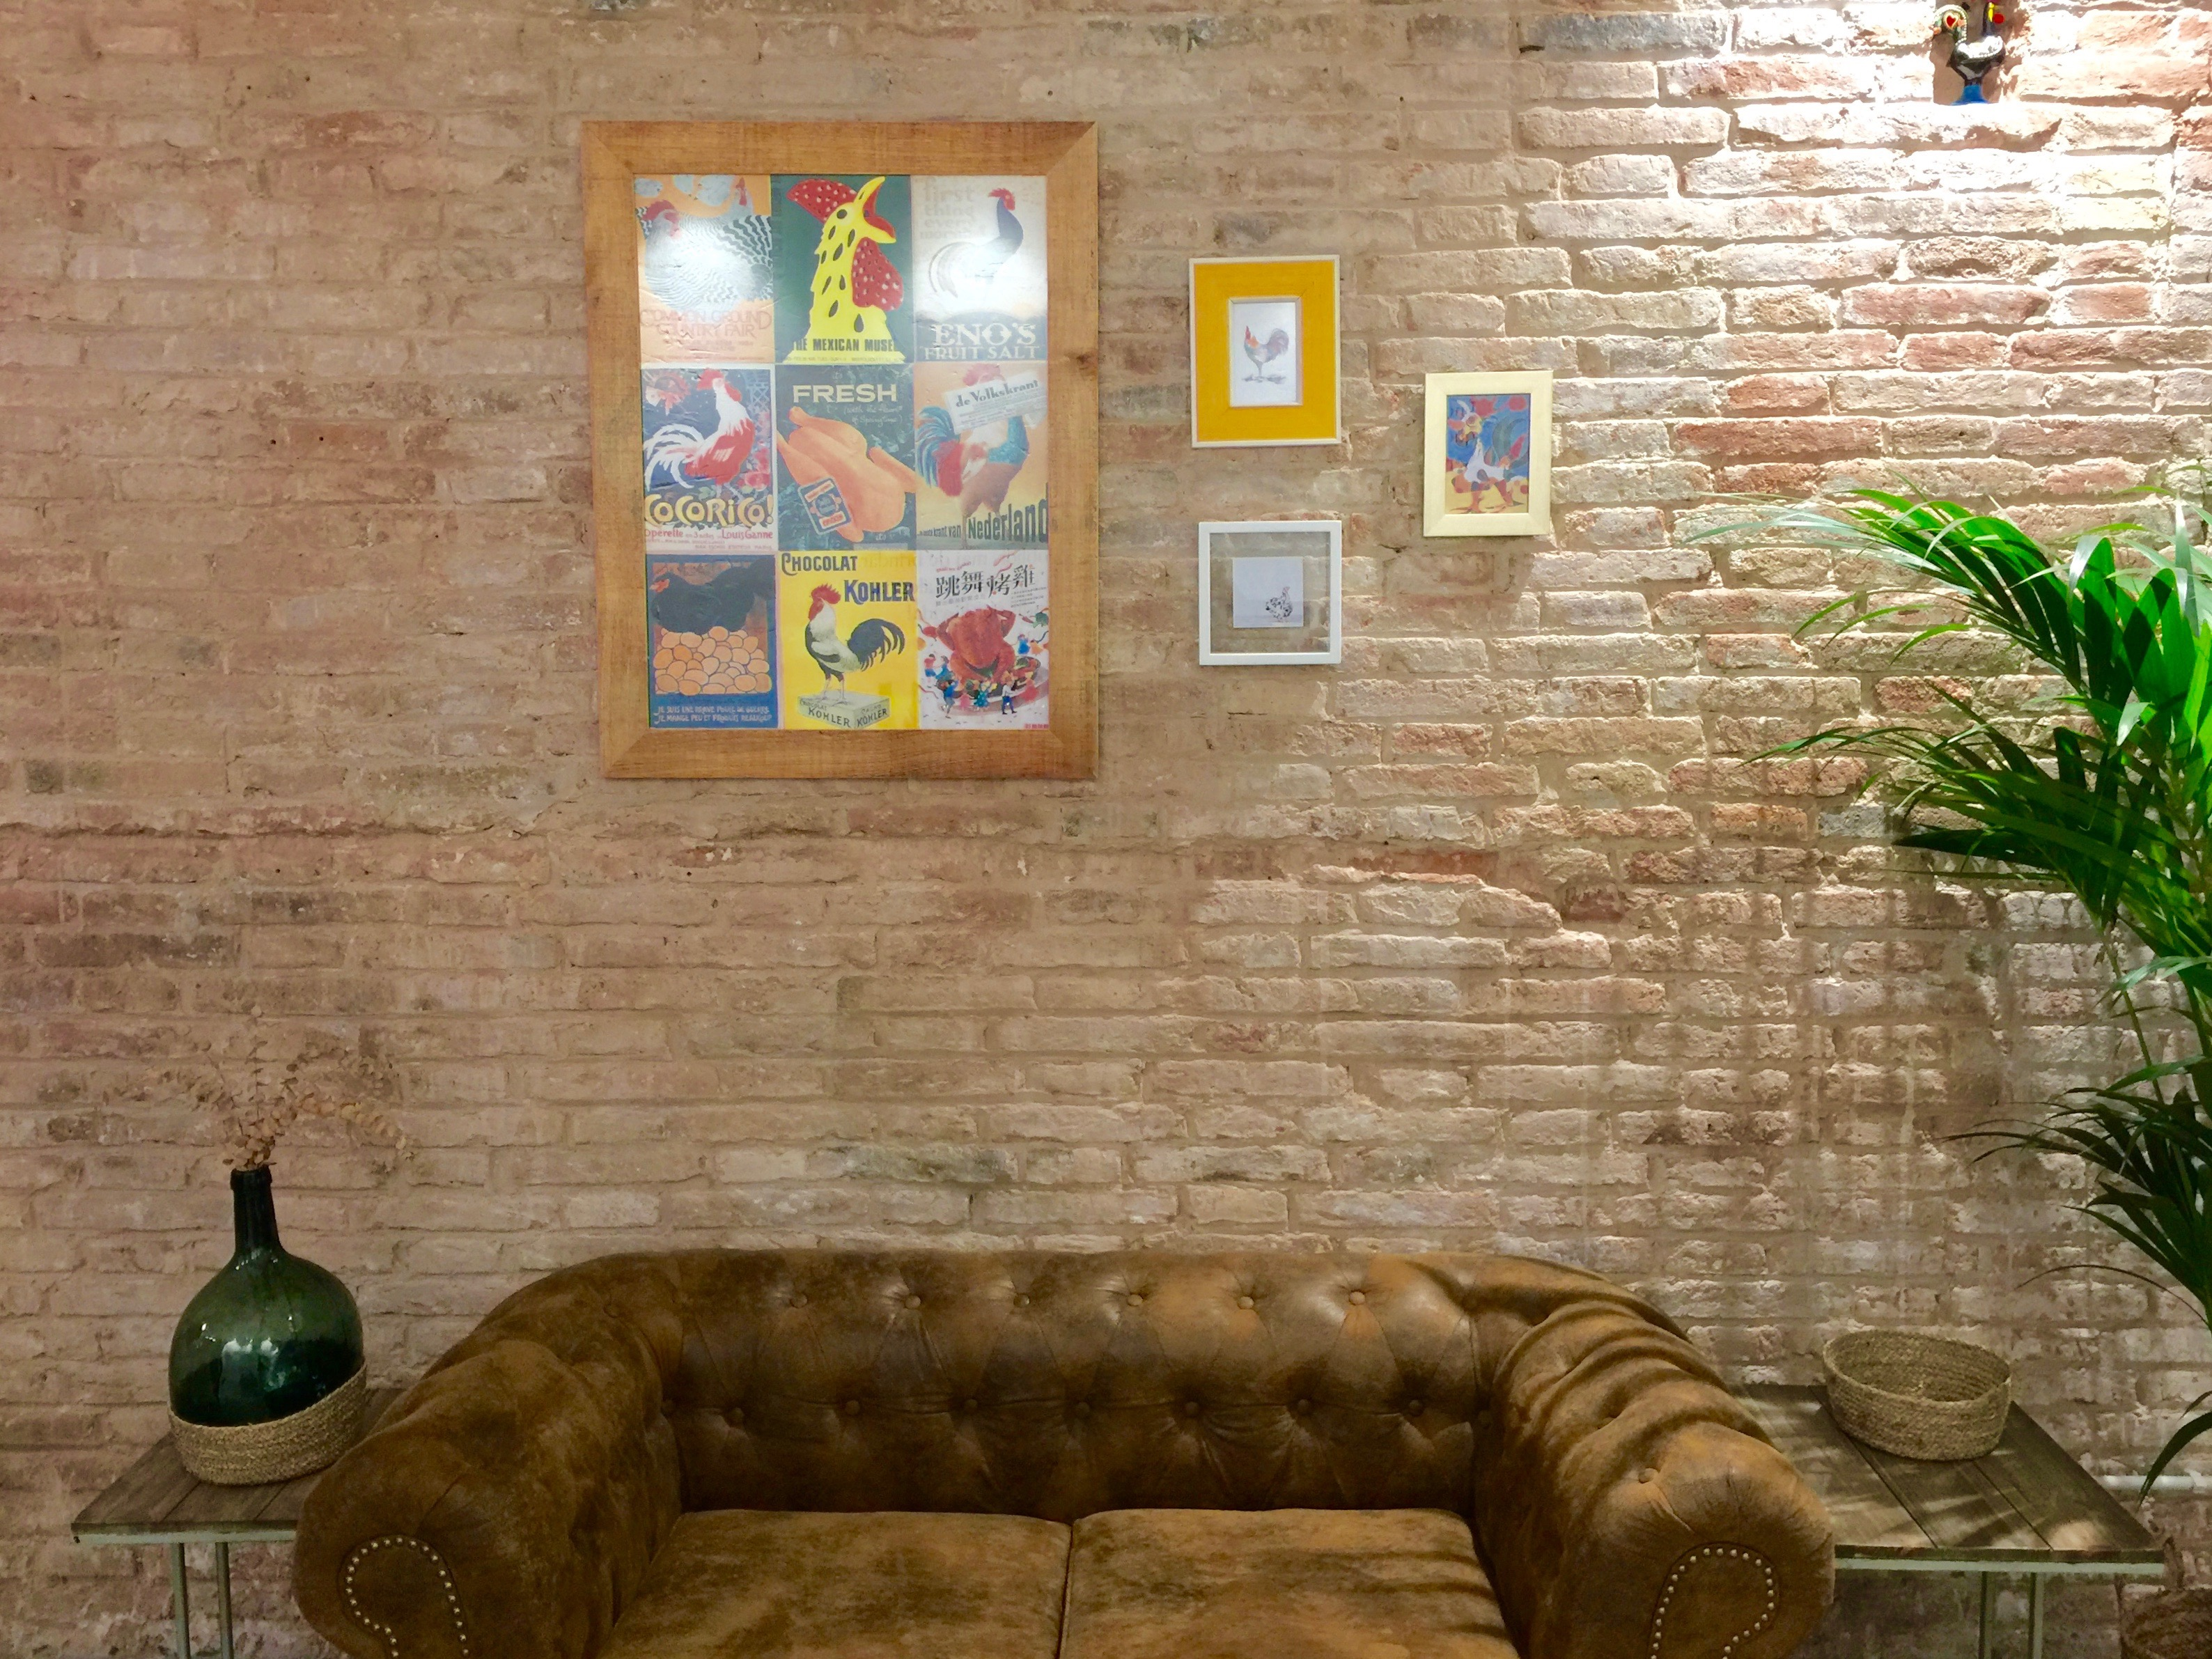 quin-pollastre-rockinchic-lifestyle-interior